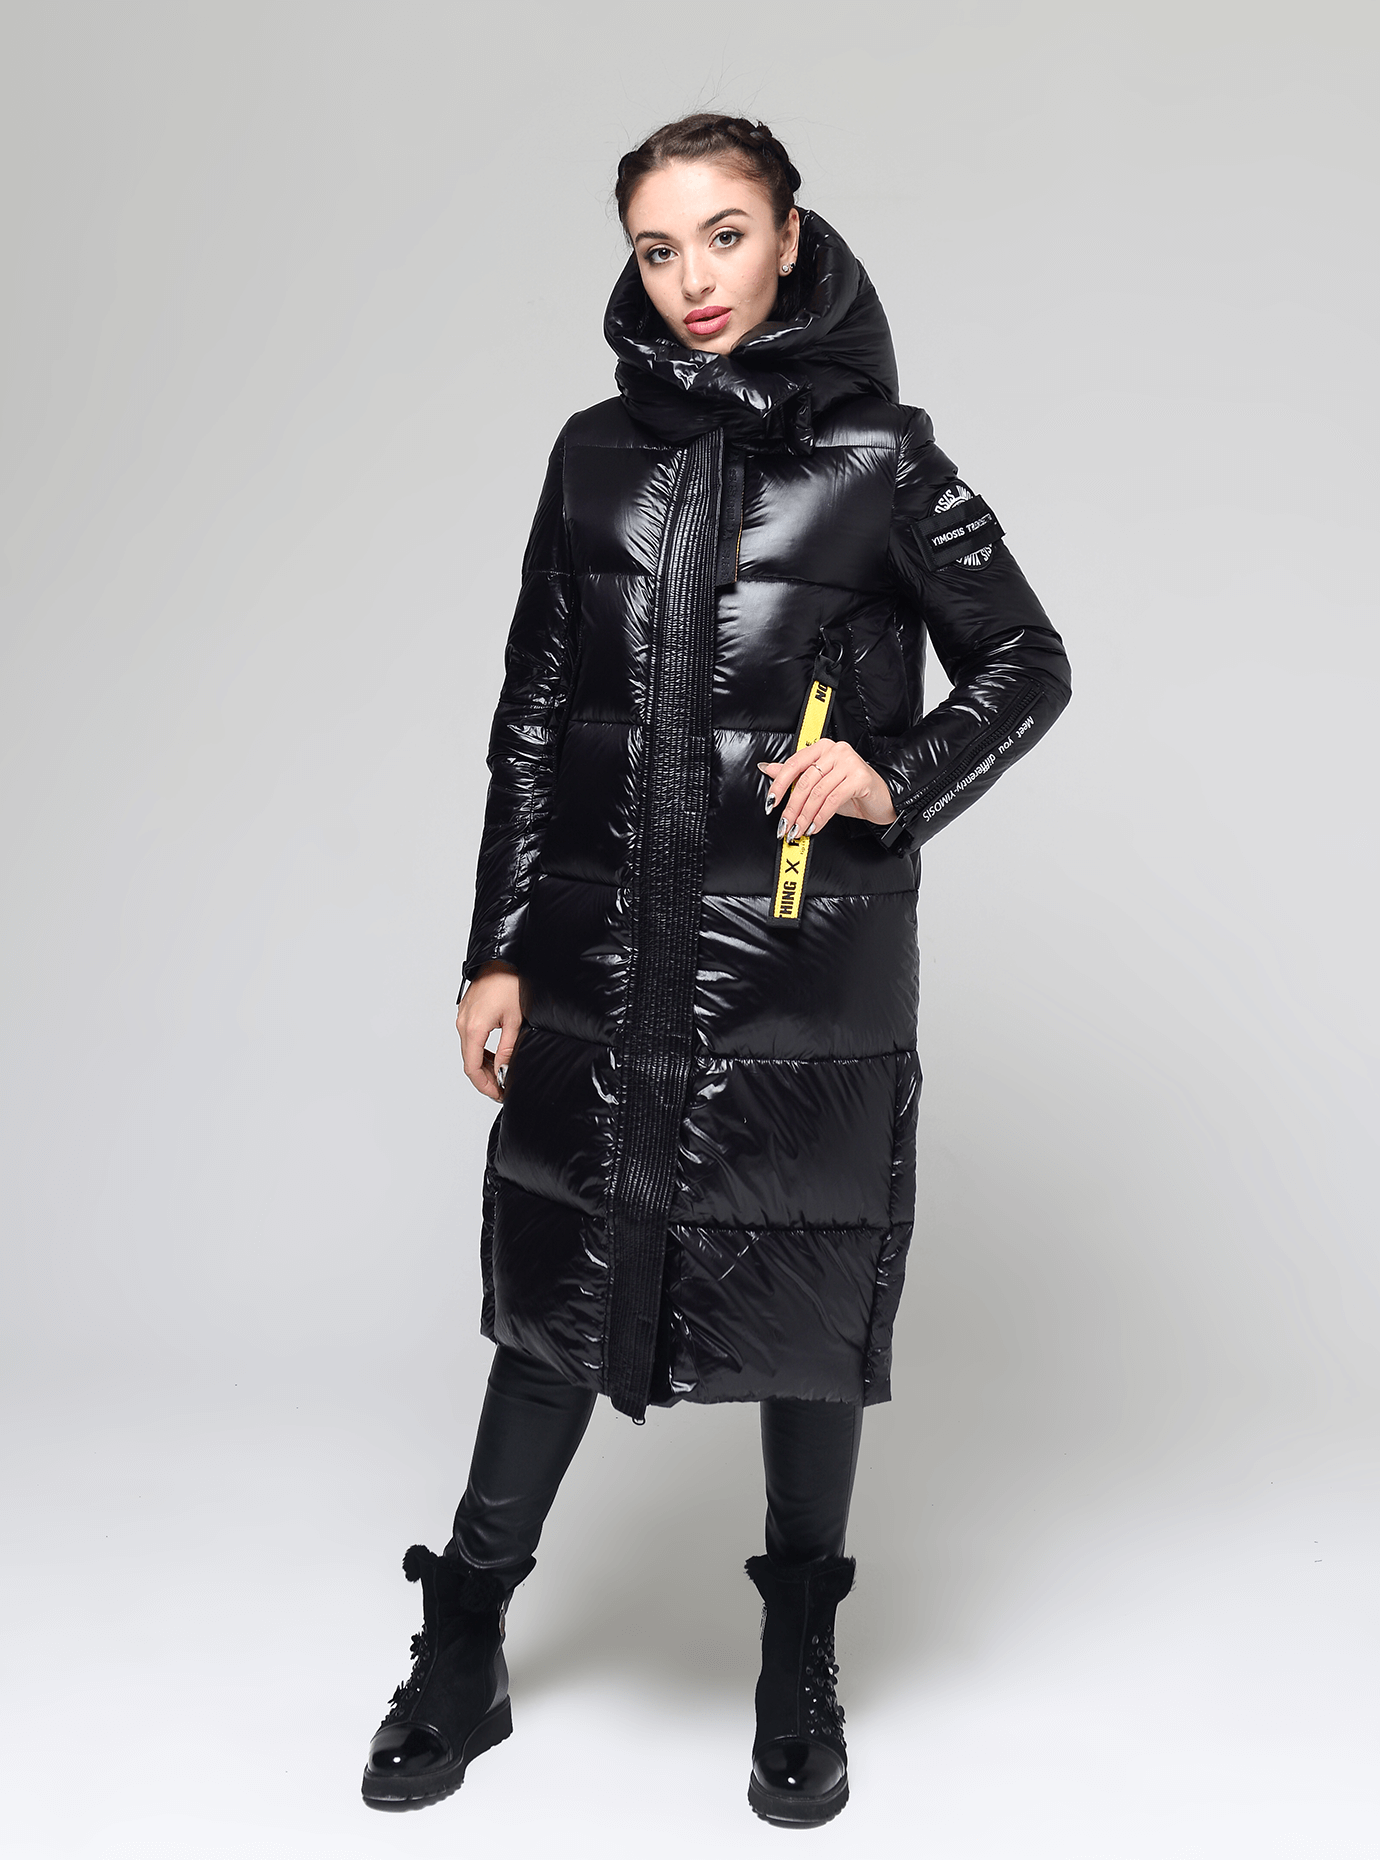 Пуховик женский с молниями на рукавах Чёрный M (02-Y191133): фото - Alster.ua